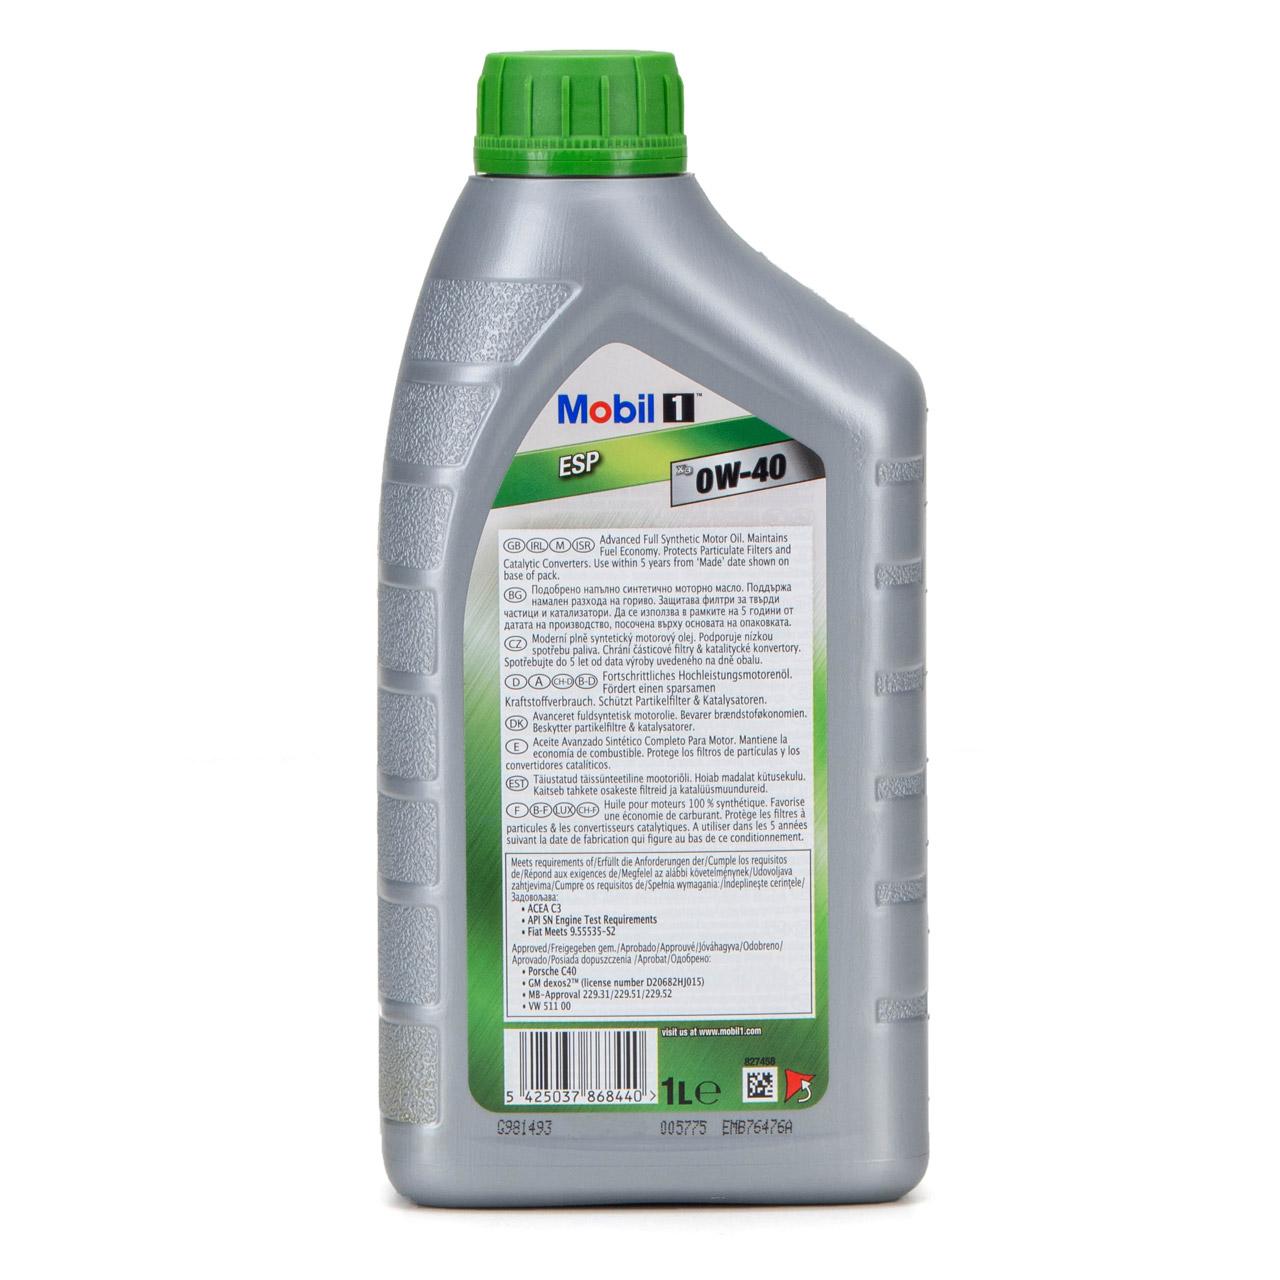 Mobil 1 ESP X3 C40 Motoröl Öl 0W-40 0W40 dexos2 PORSCHE C40 VW 511.00 - 1 Liter